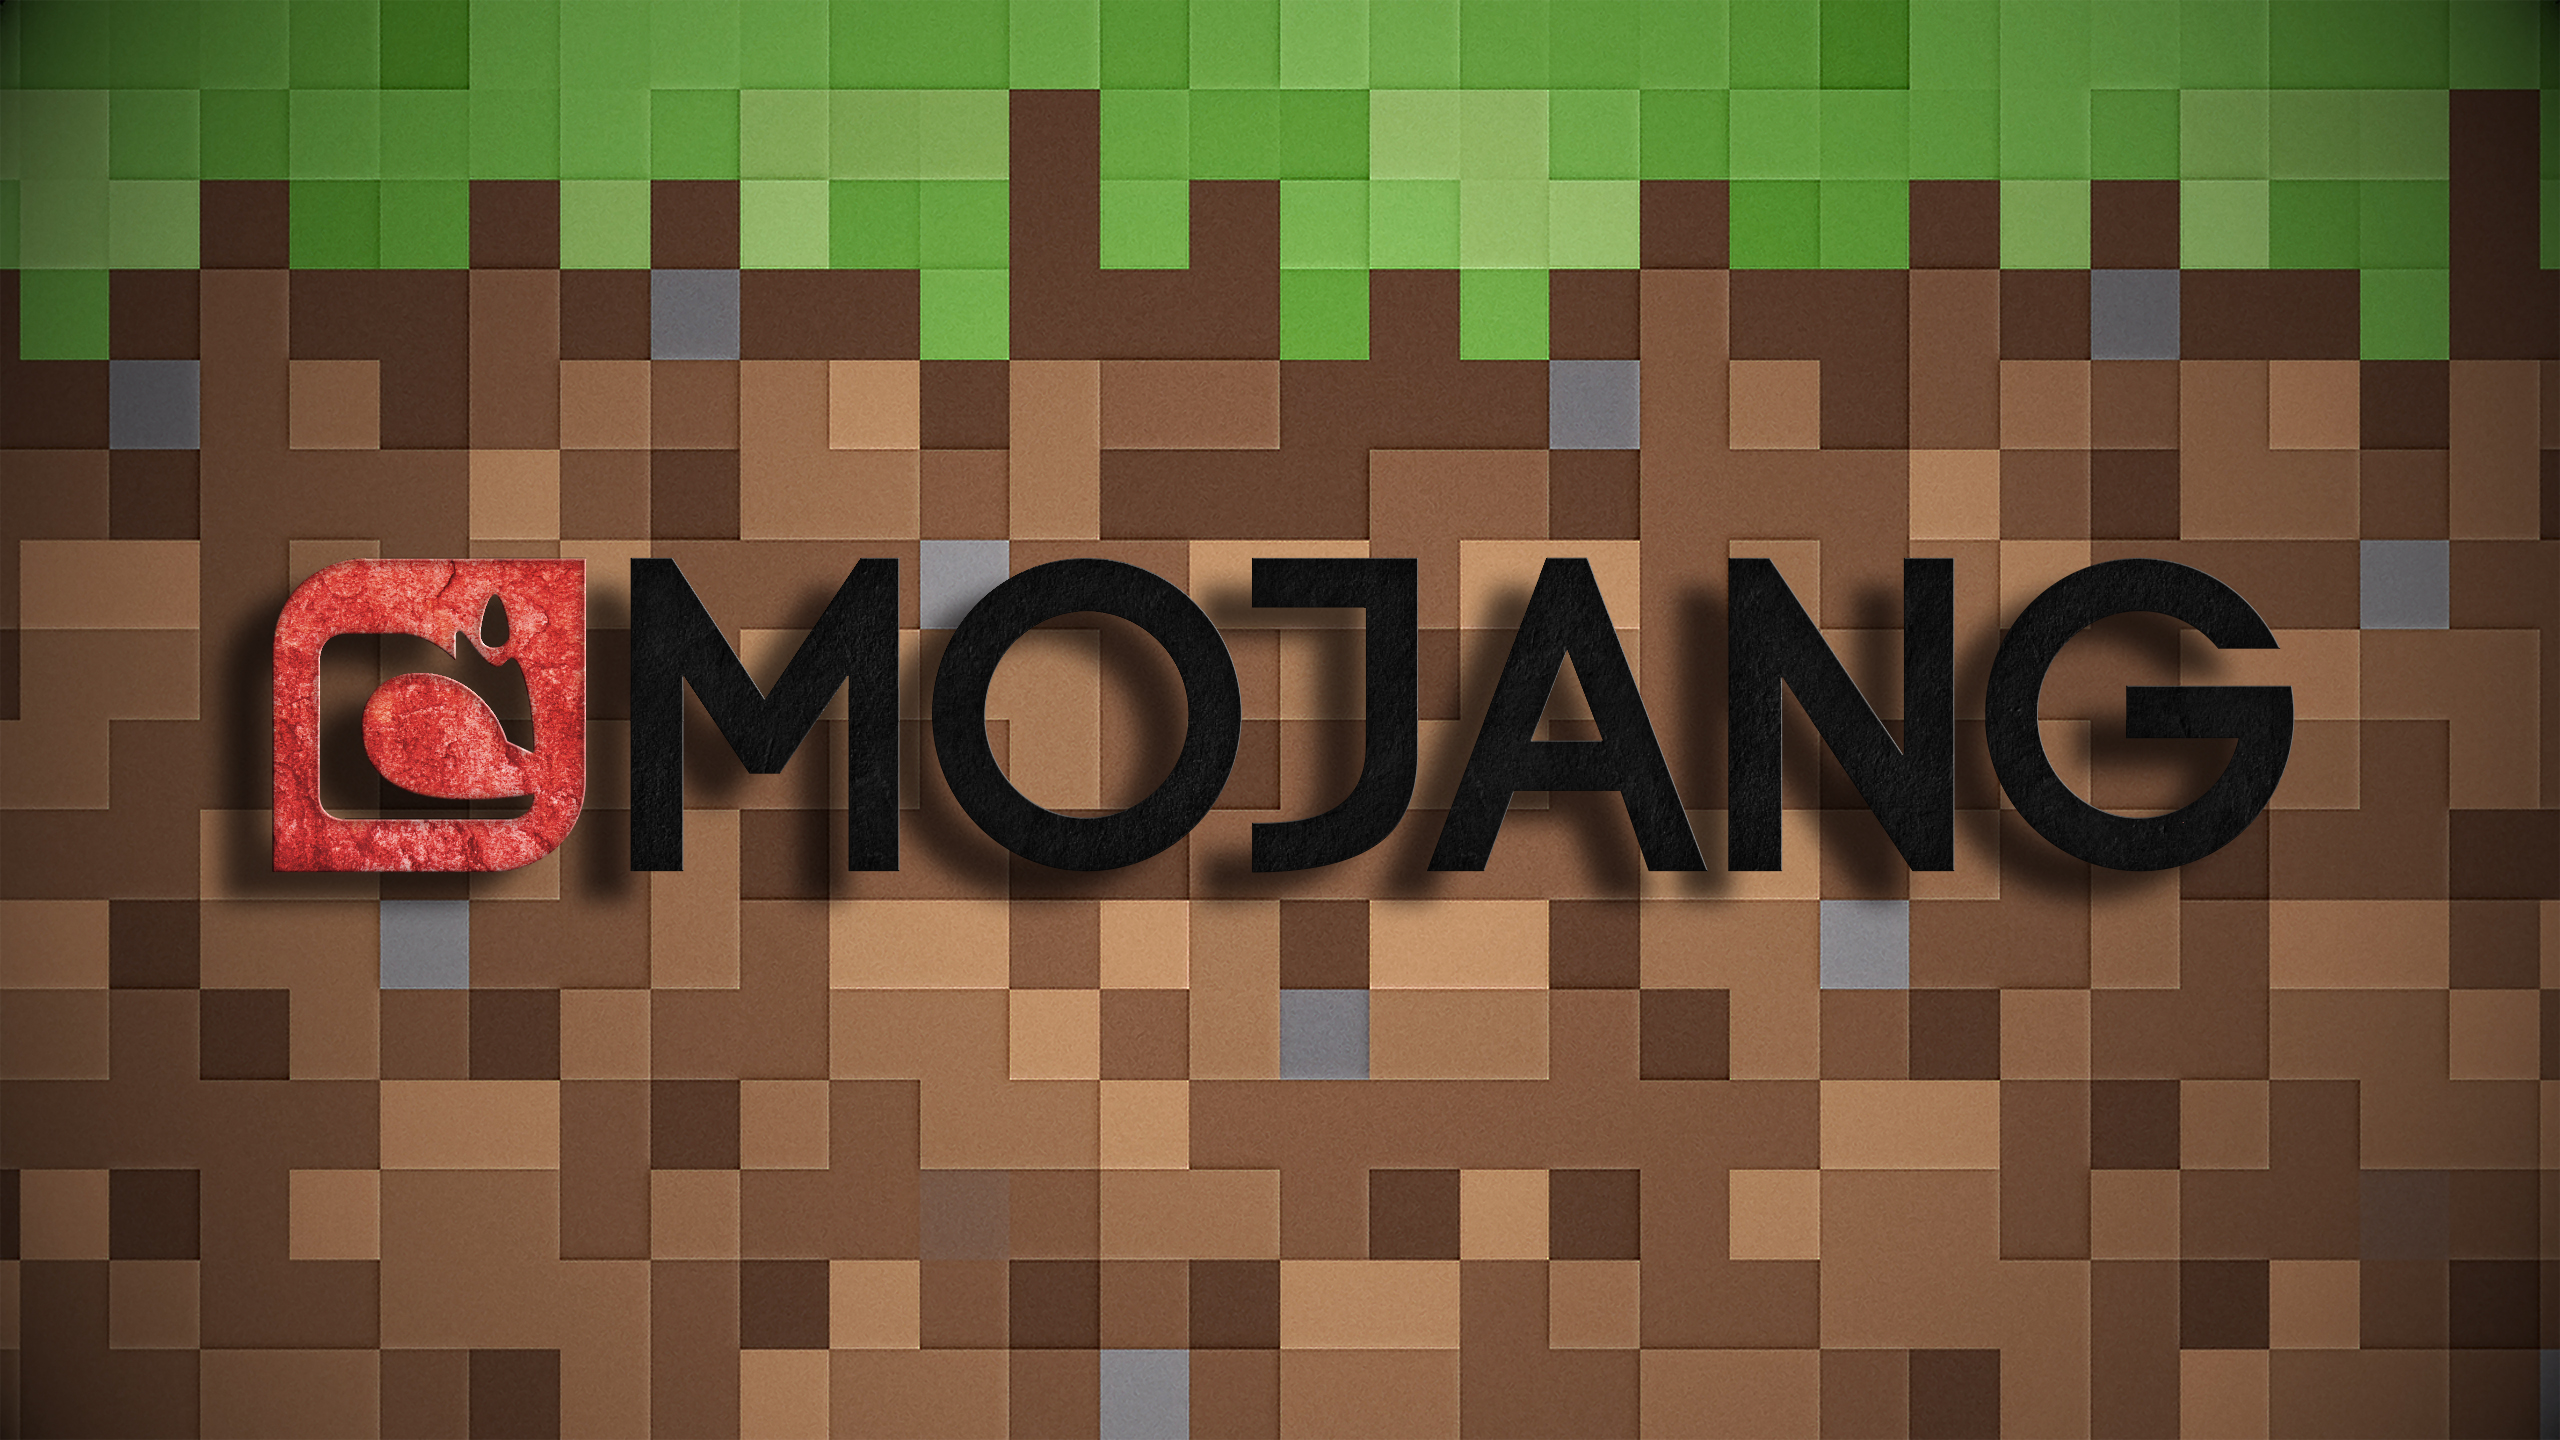 Confirmado: Microsoft compró Mojang - Taringa!